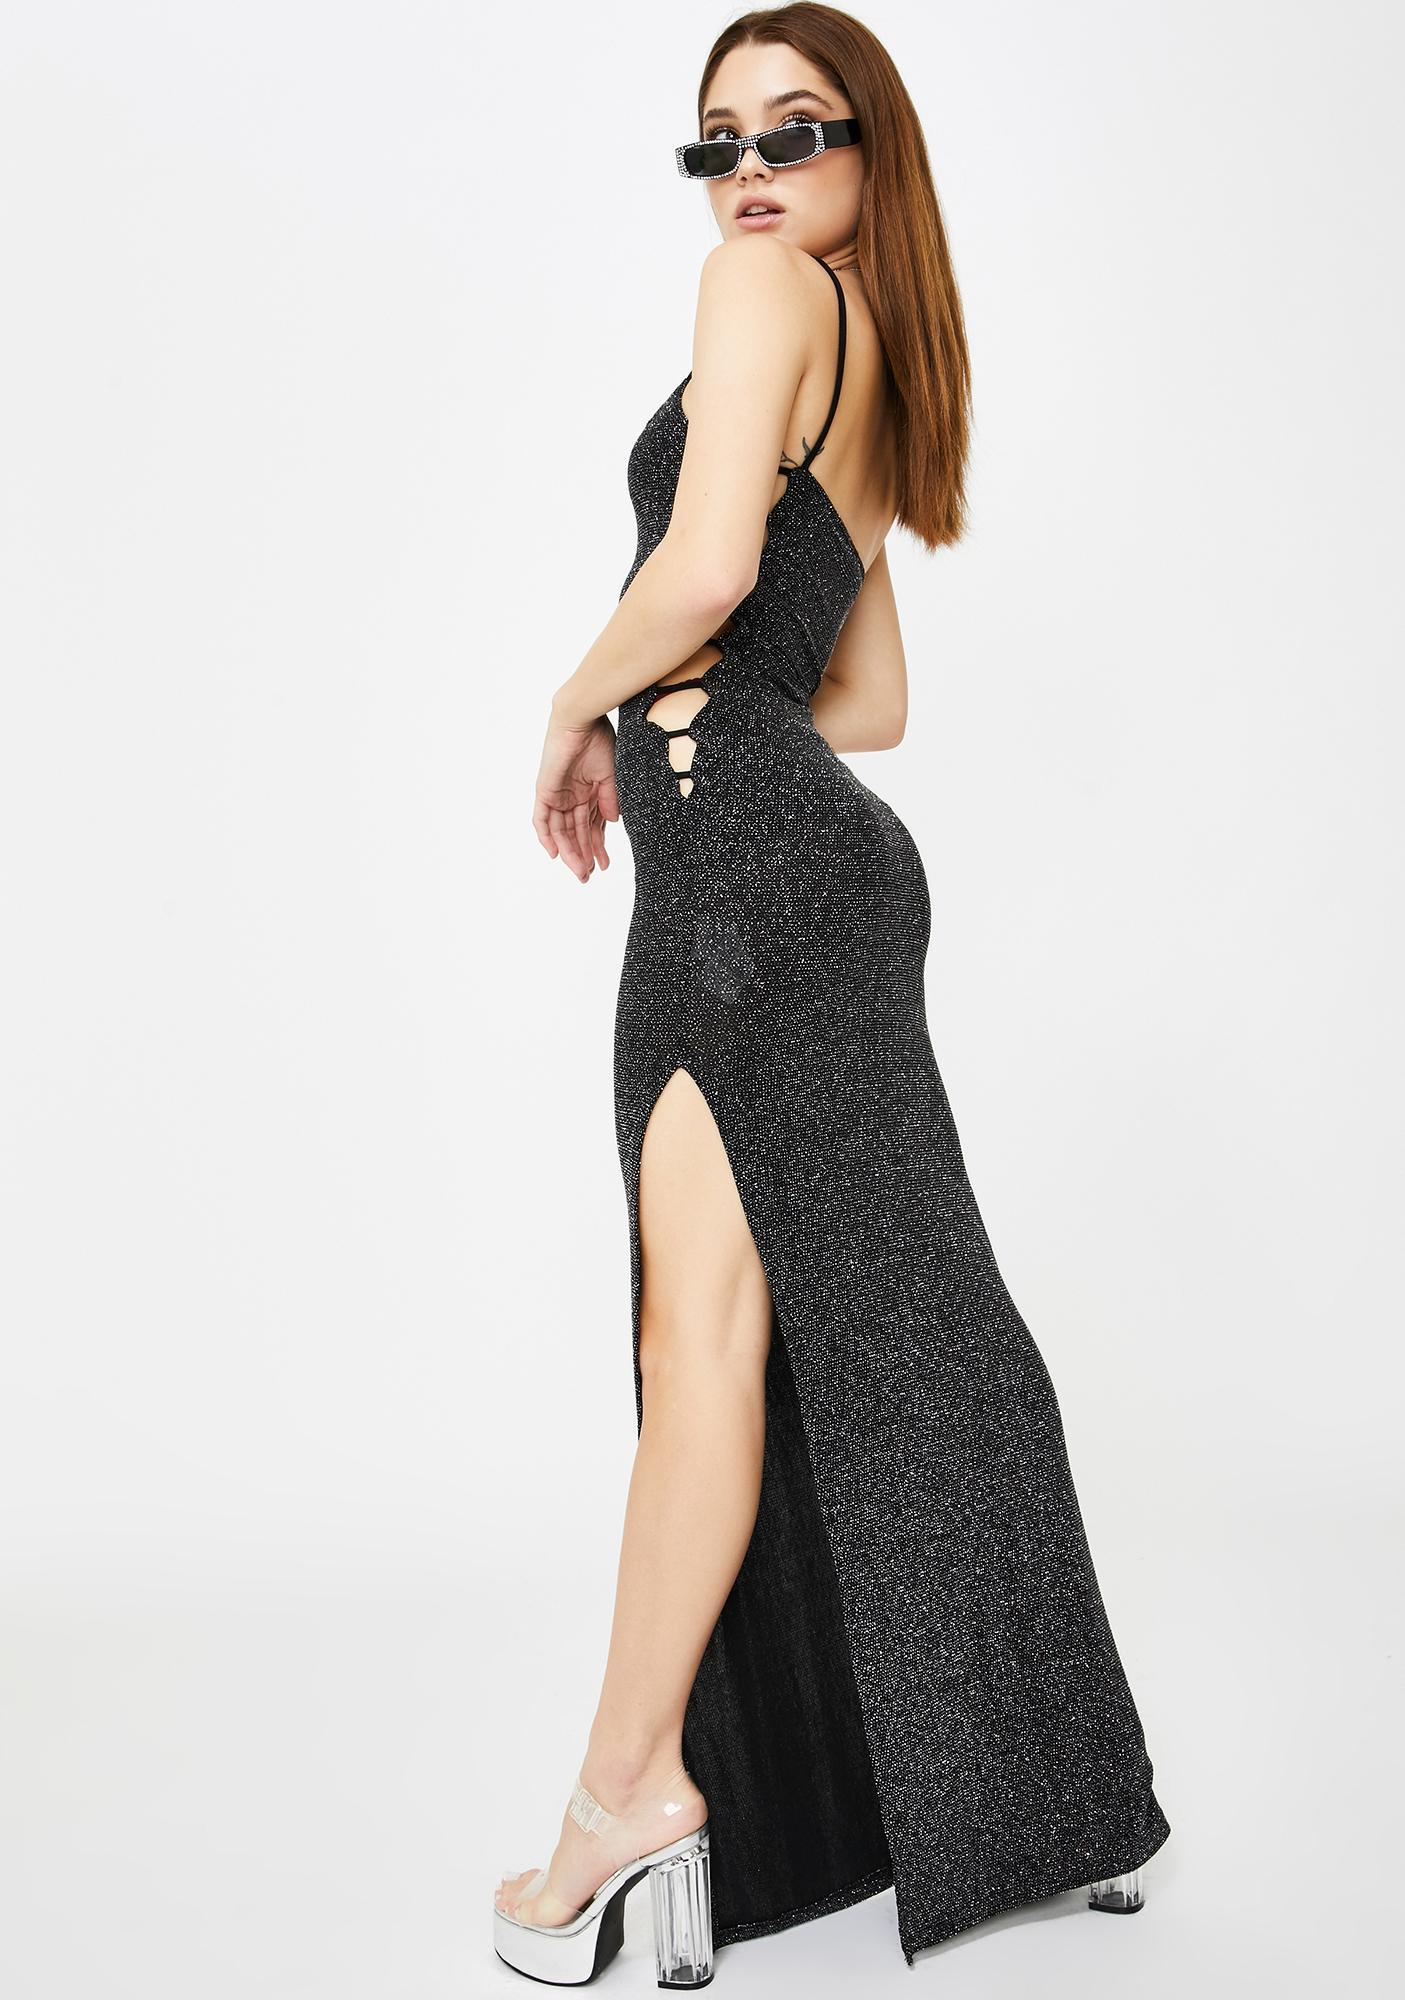 Kiki Riki Risky Reward Maxi Dress